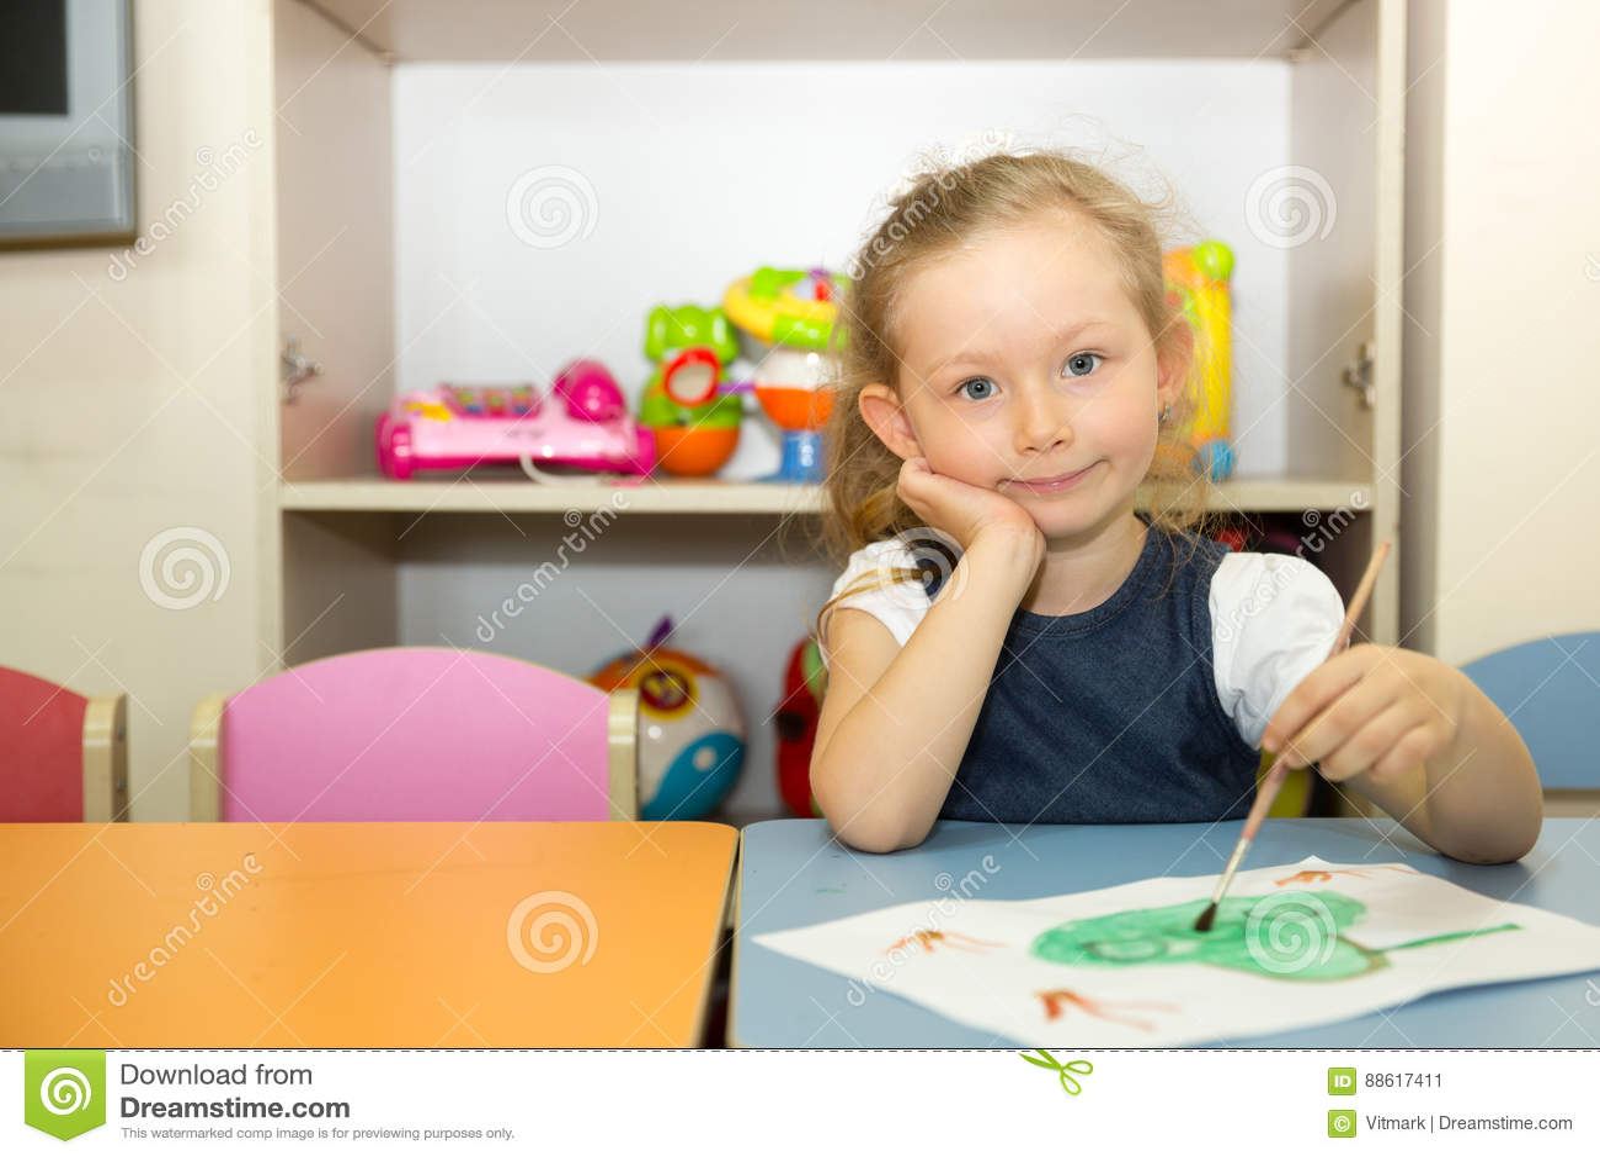 Adorable child girl draws a brush and paints in nursery room. Kid in kindergarten in Montessori preschool class.